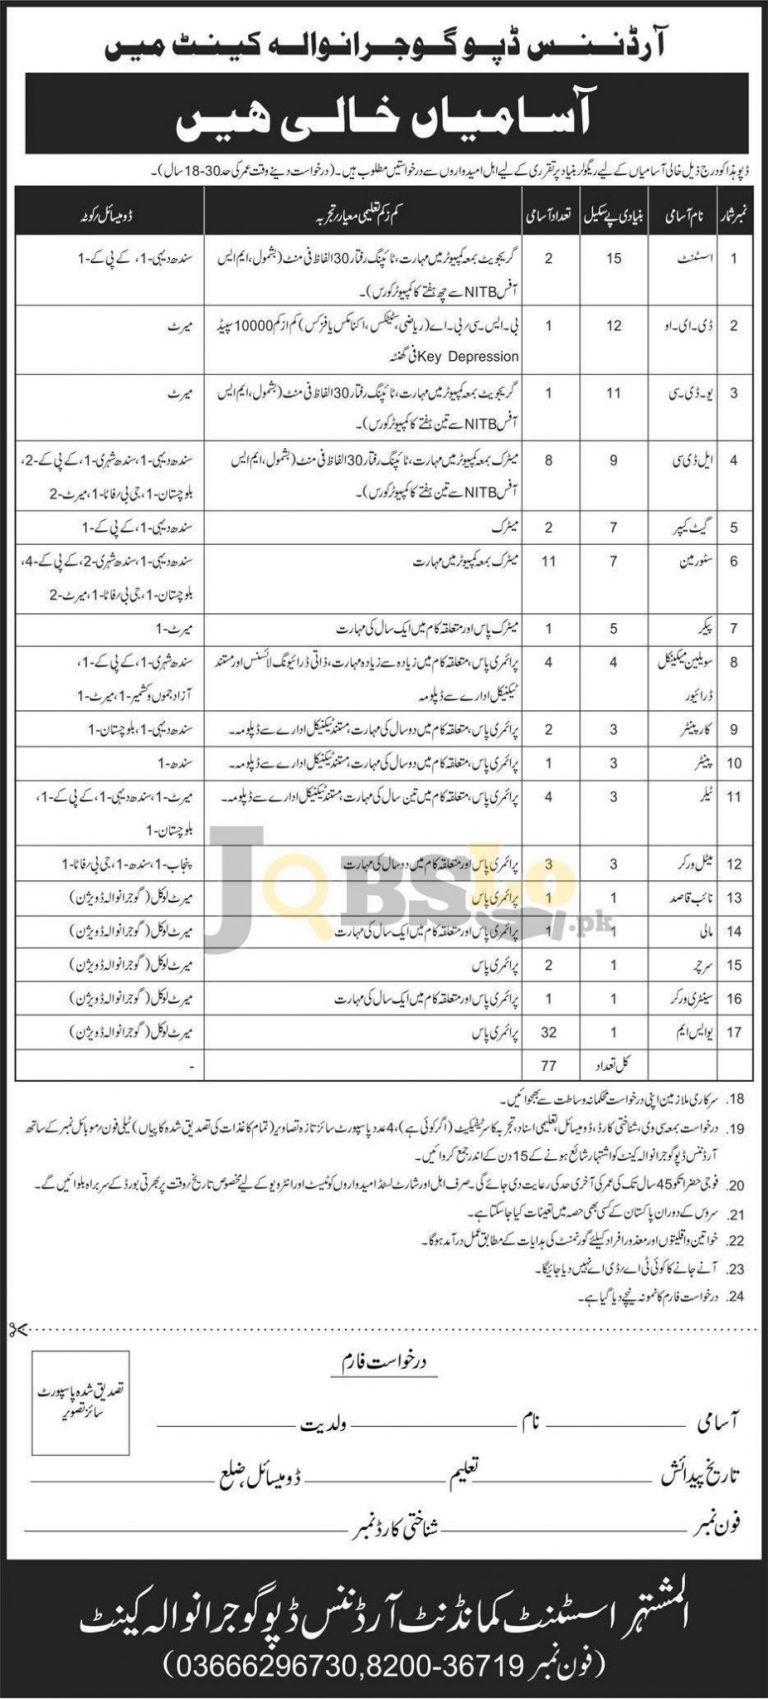 Ordnance Depot Gujranwala Civilians Jobs 2018 Pak Army Latest Vacancies